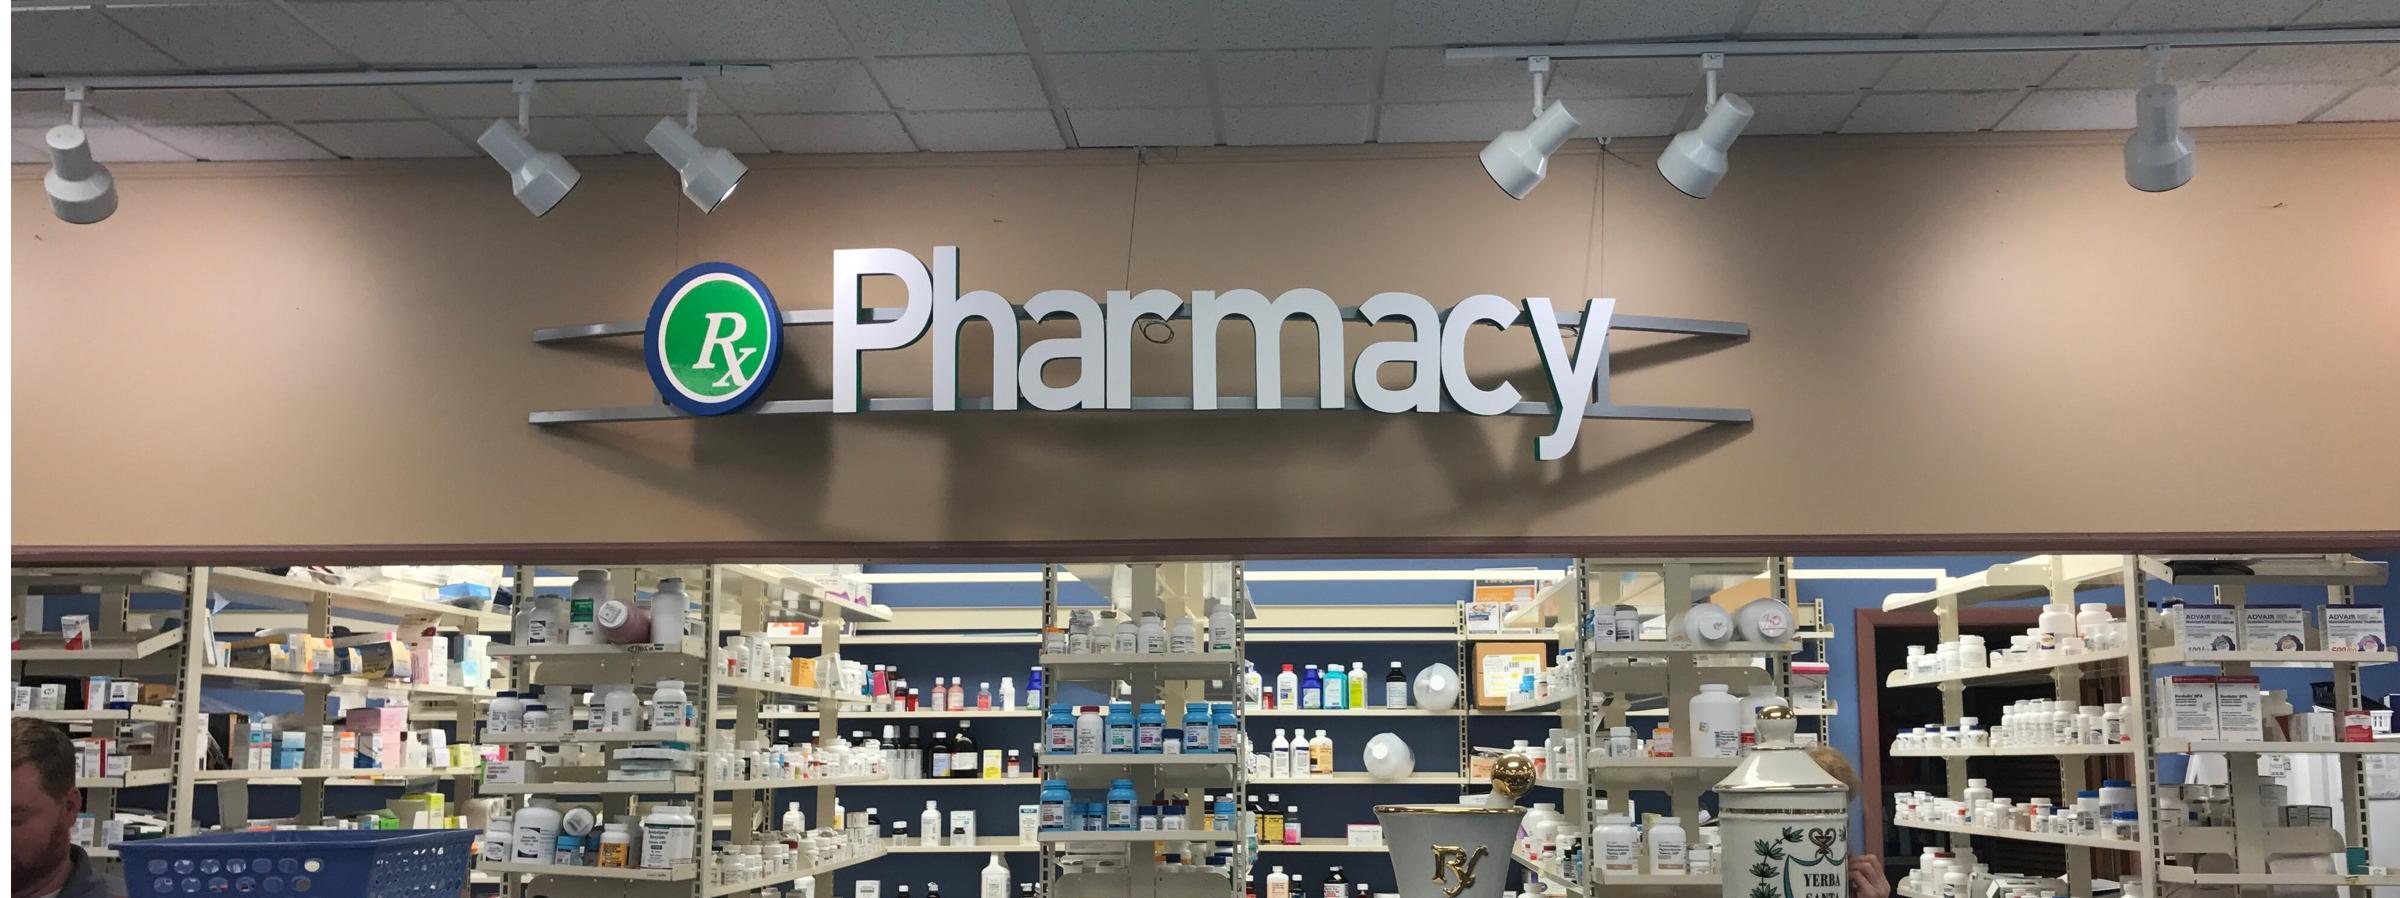 Refill RX Hood's Pharmacy, Valley, AL